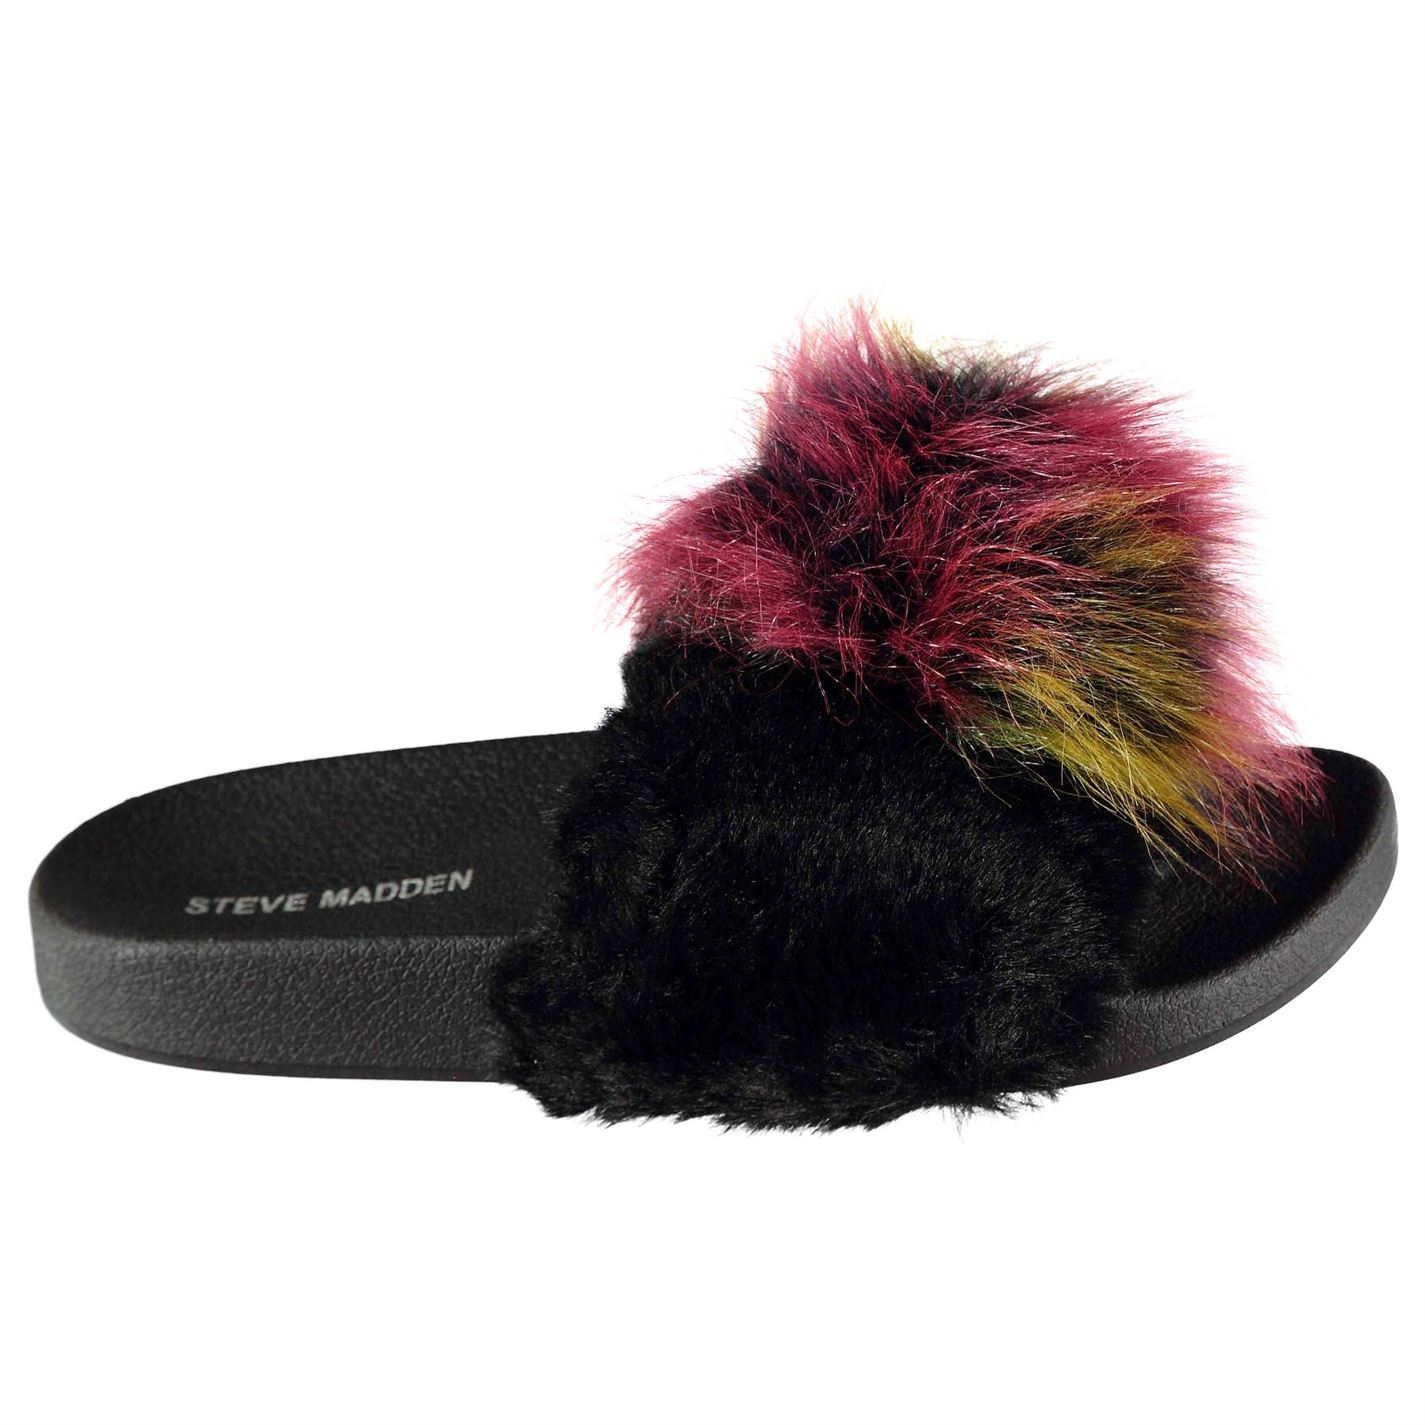 023455b49ae Details about Womens Steve Madden Fur Mule Sliders Flip Flops Slip On  Textured New